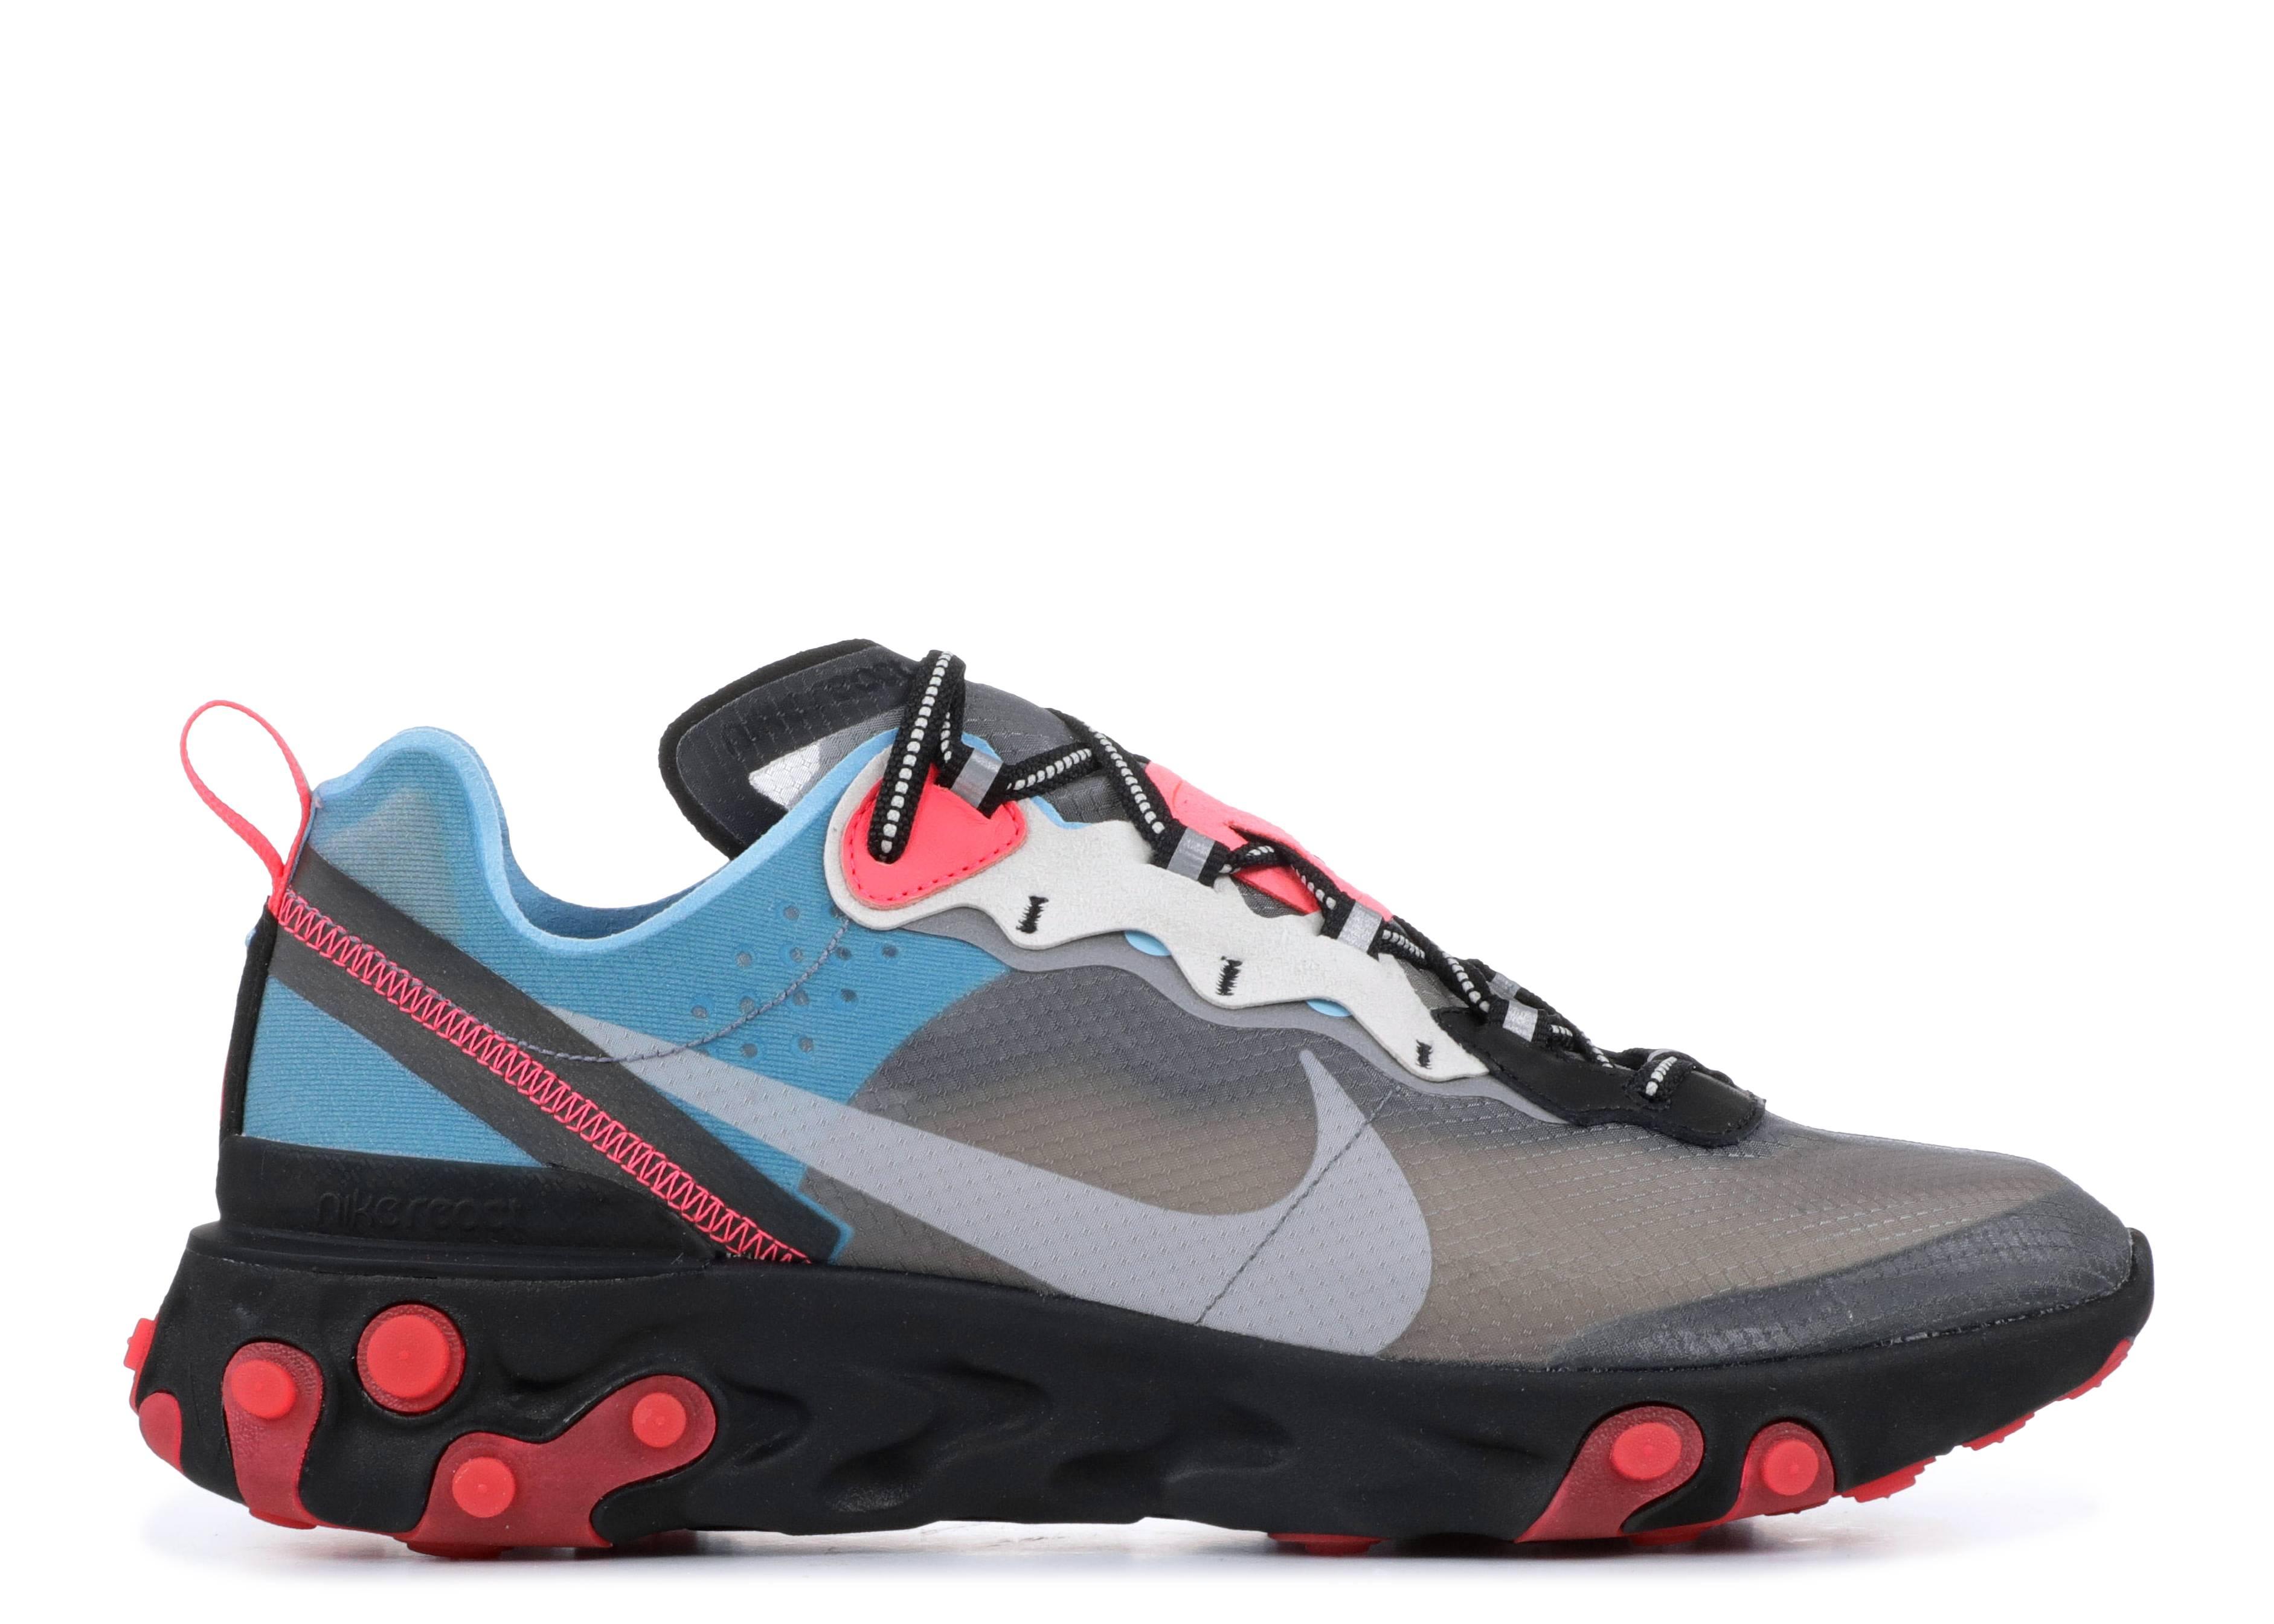 flojo Asado atmósfera  React Element 87 'Solar Red' - Nike - AQ1090 006 - black/cool grey-blue  chill-solar red | Flight Club